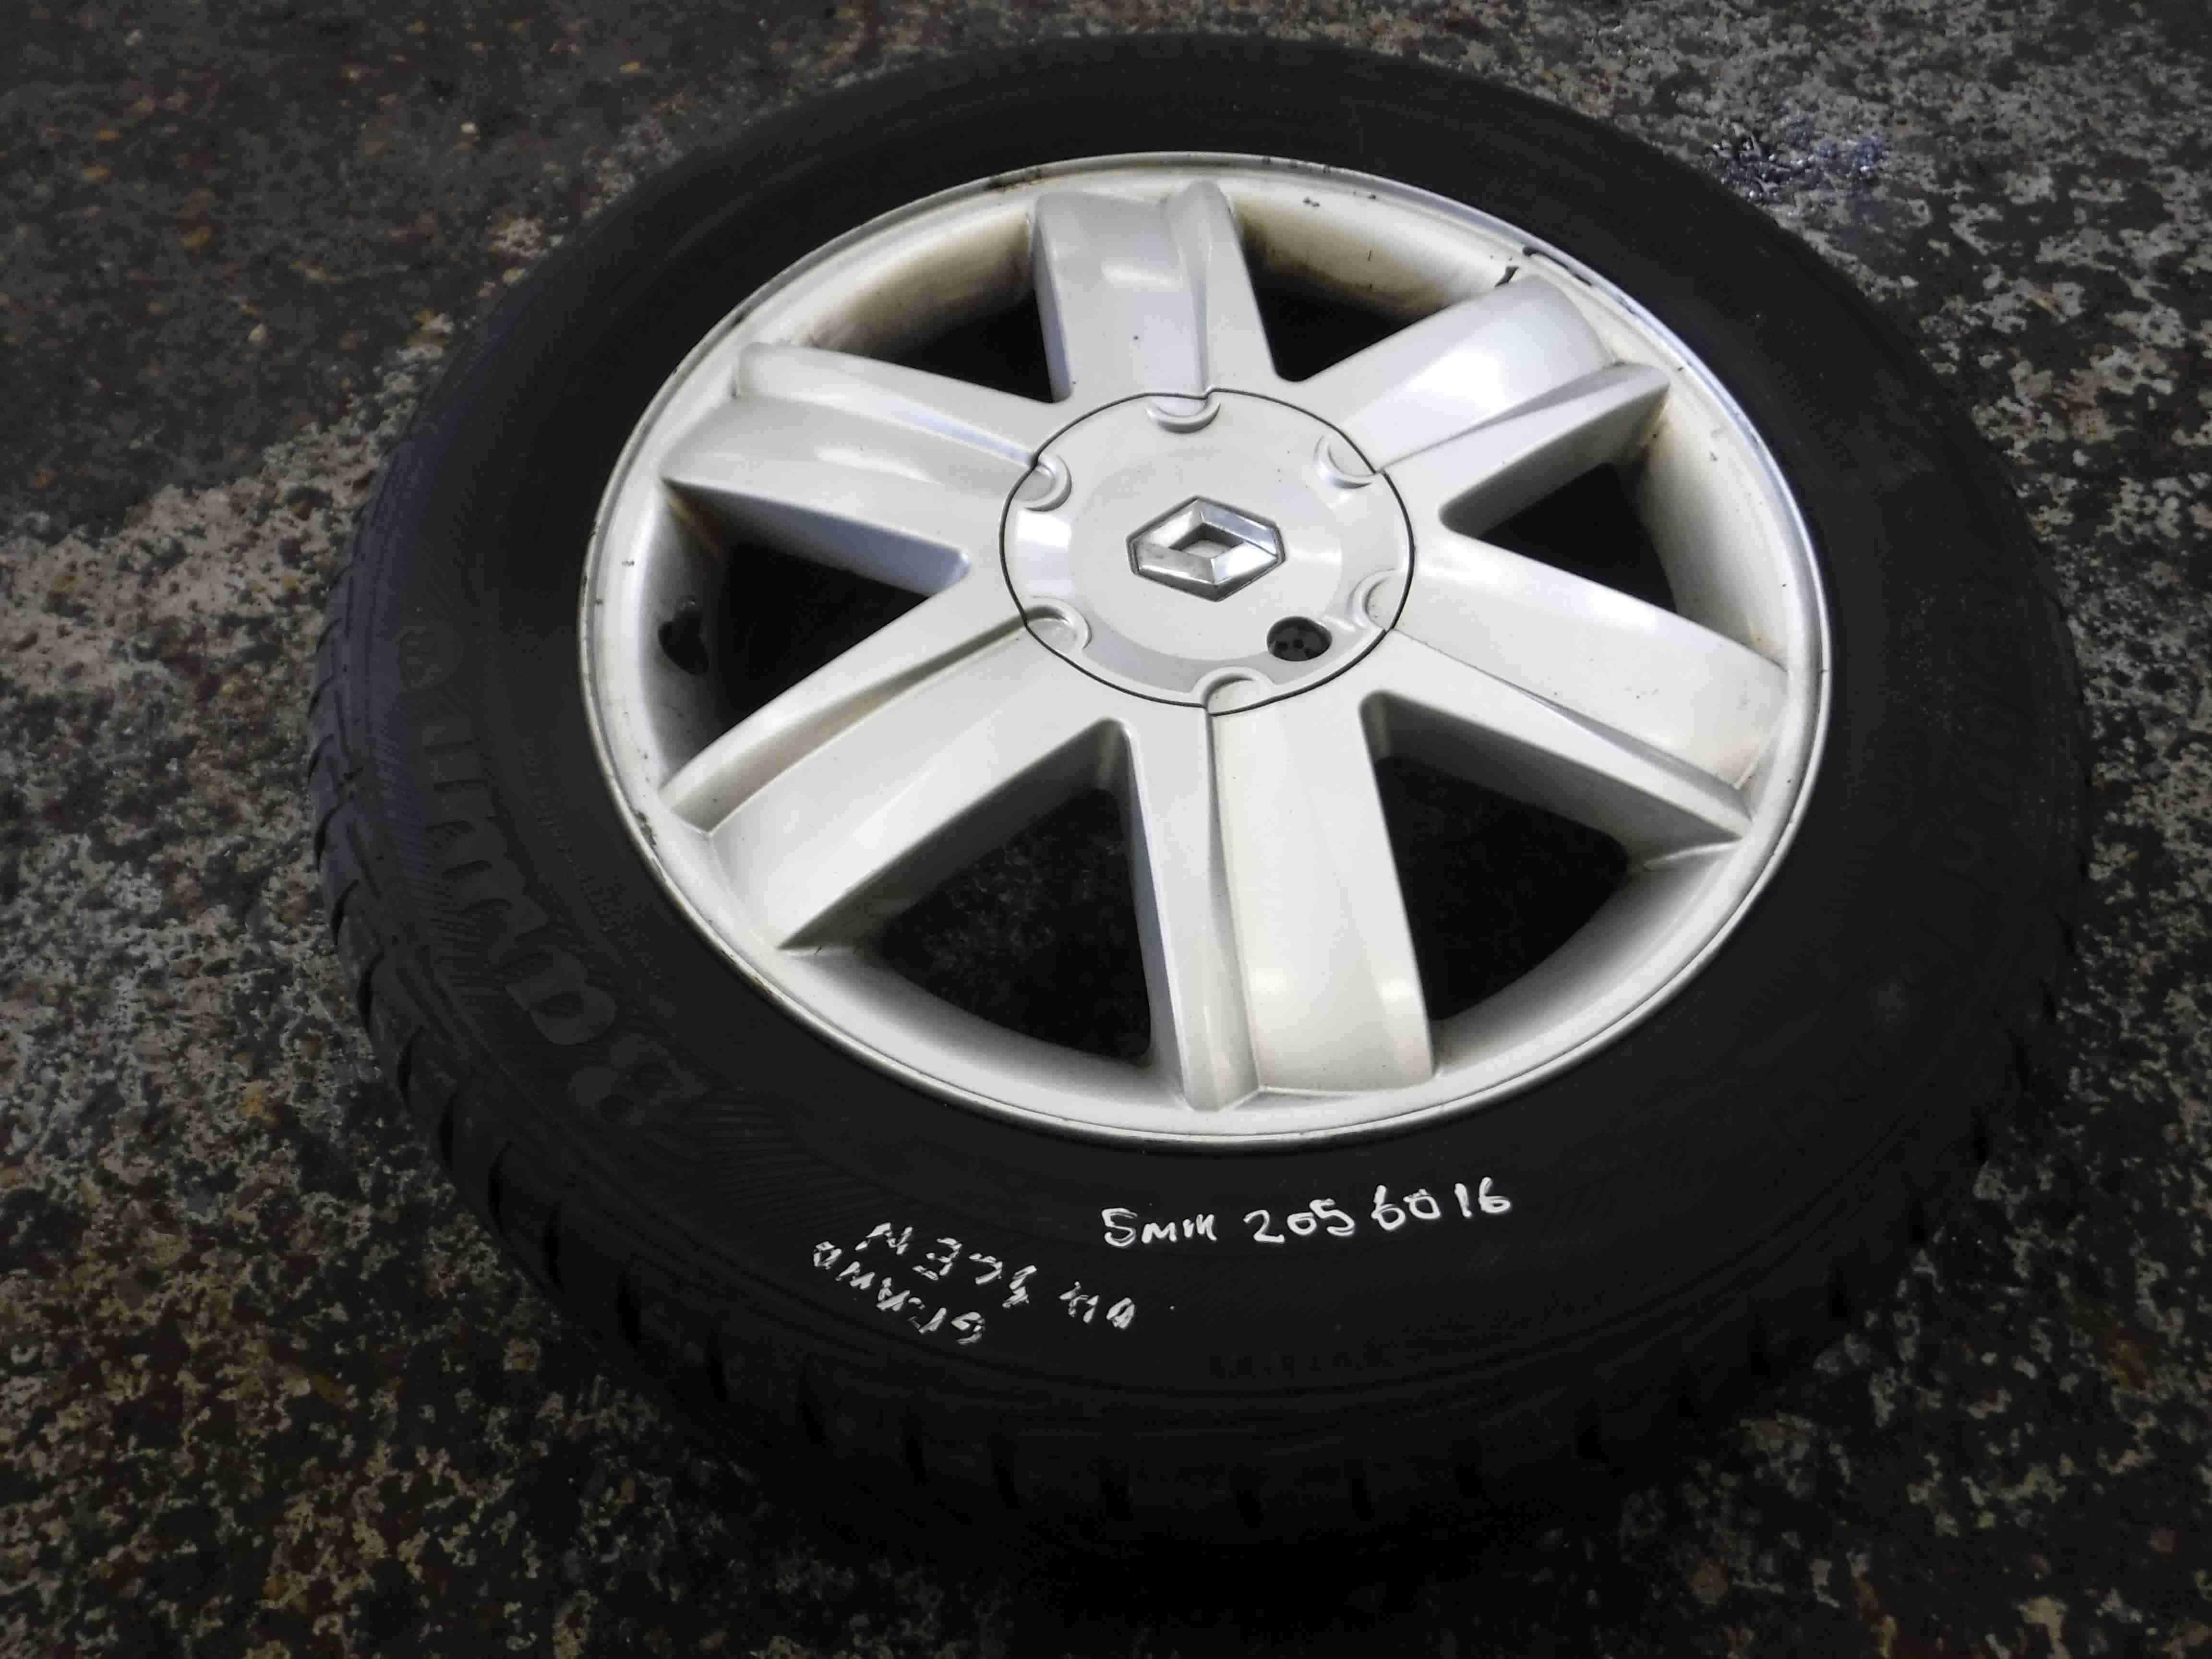 Renault Scenic 2003-2009 Nervastella Alloy Wheel + Tyre 205 60 16 5mm Tread 4/5